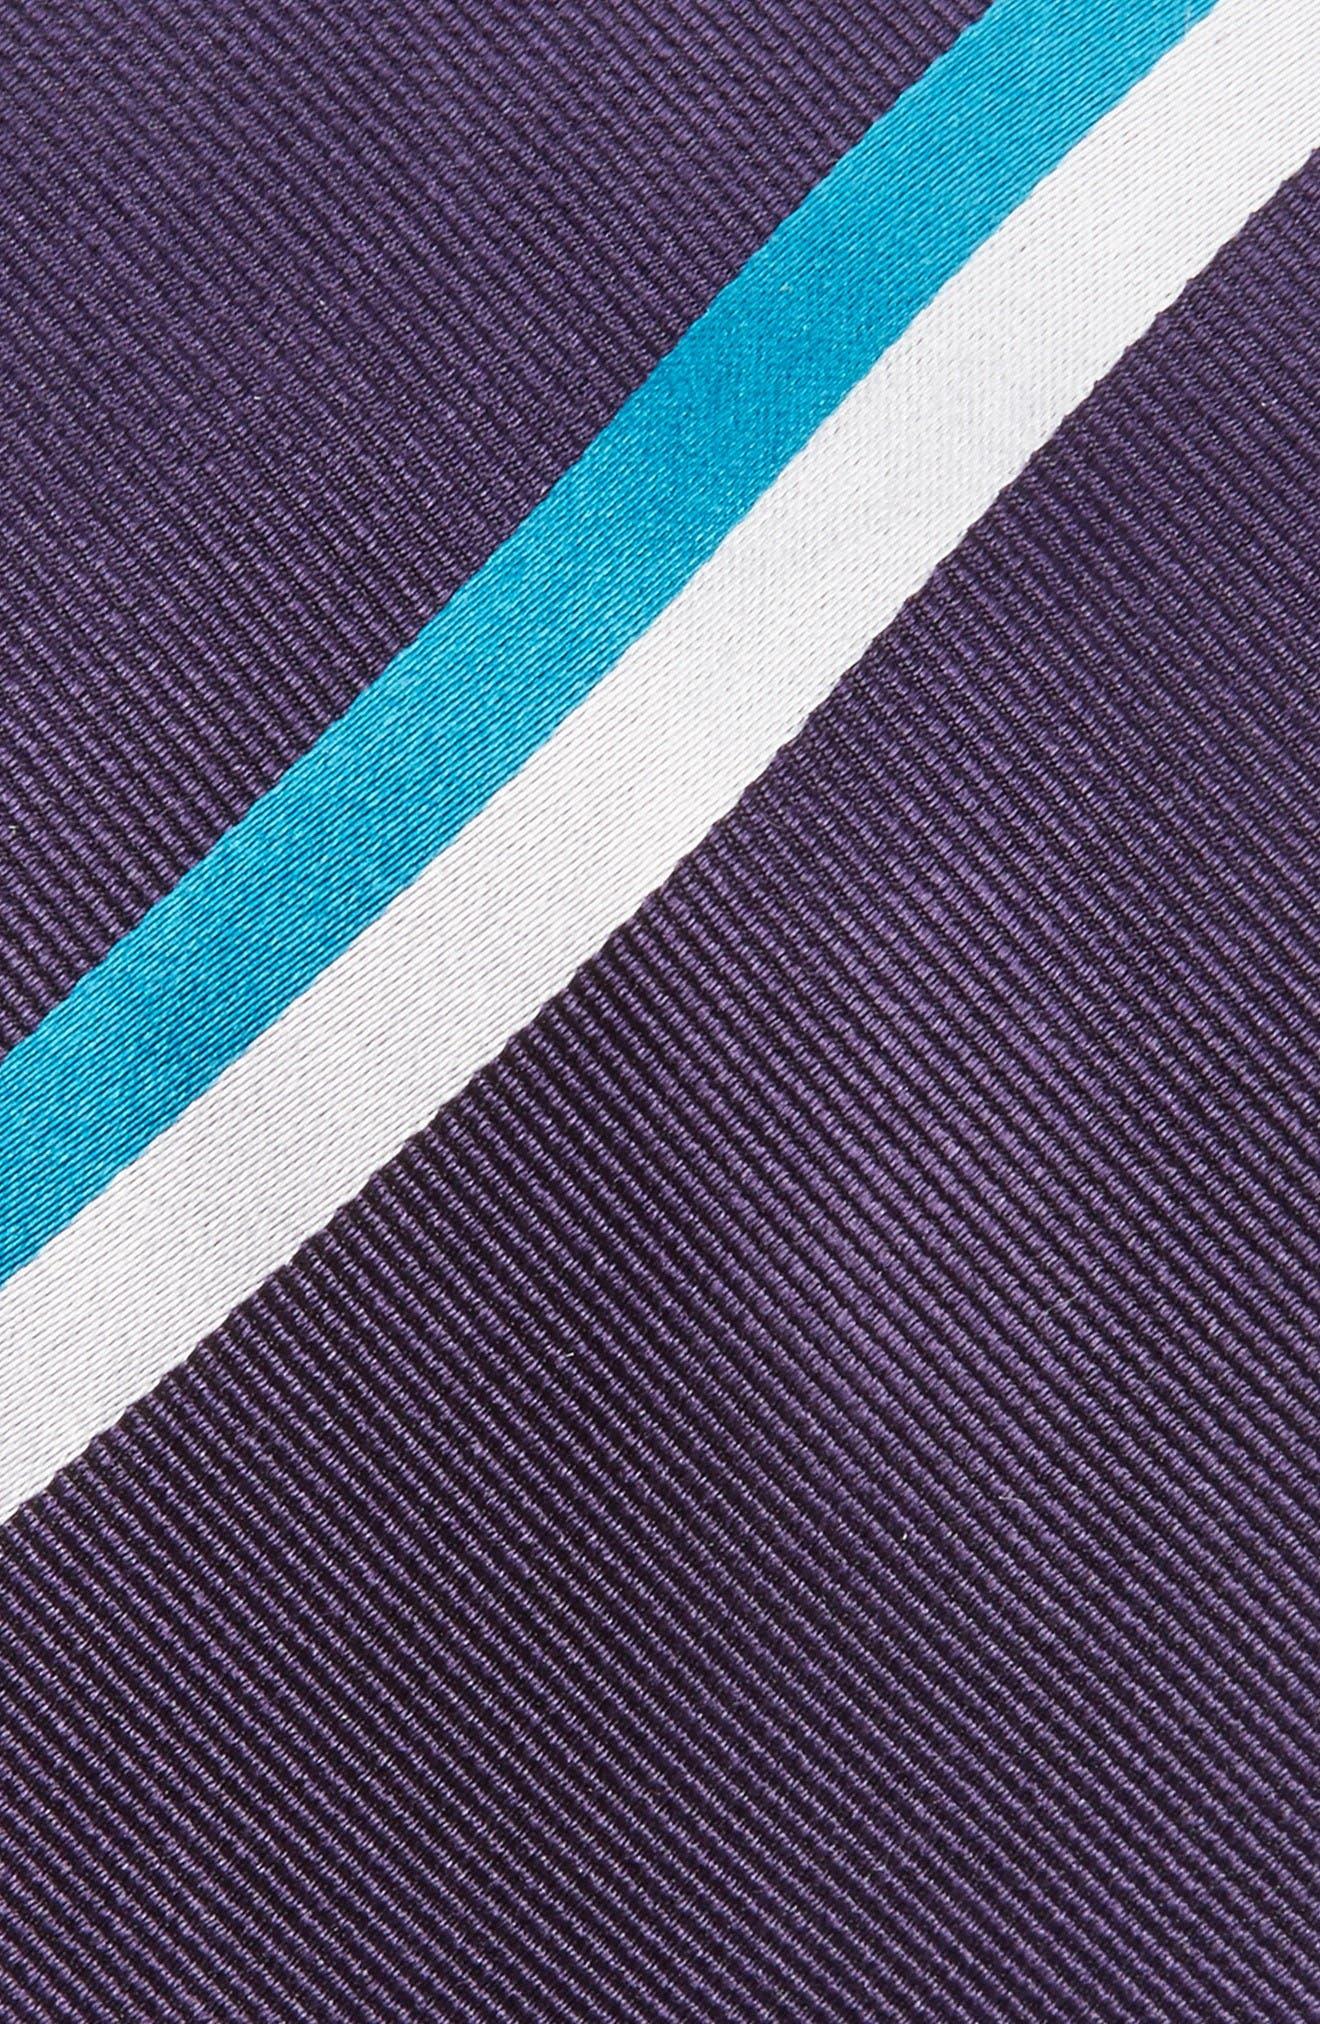 Alternate Image 2  - The Tie Bar Ad Stripe Silk Tie